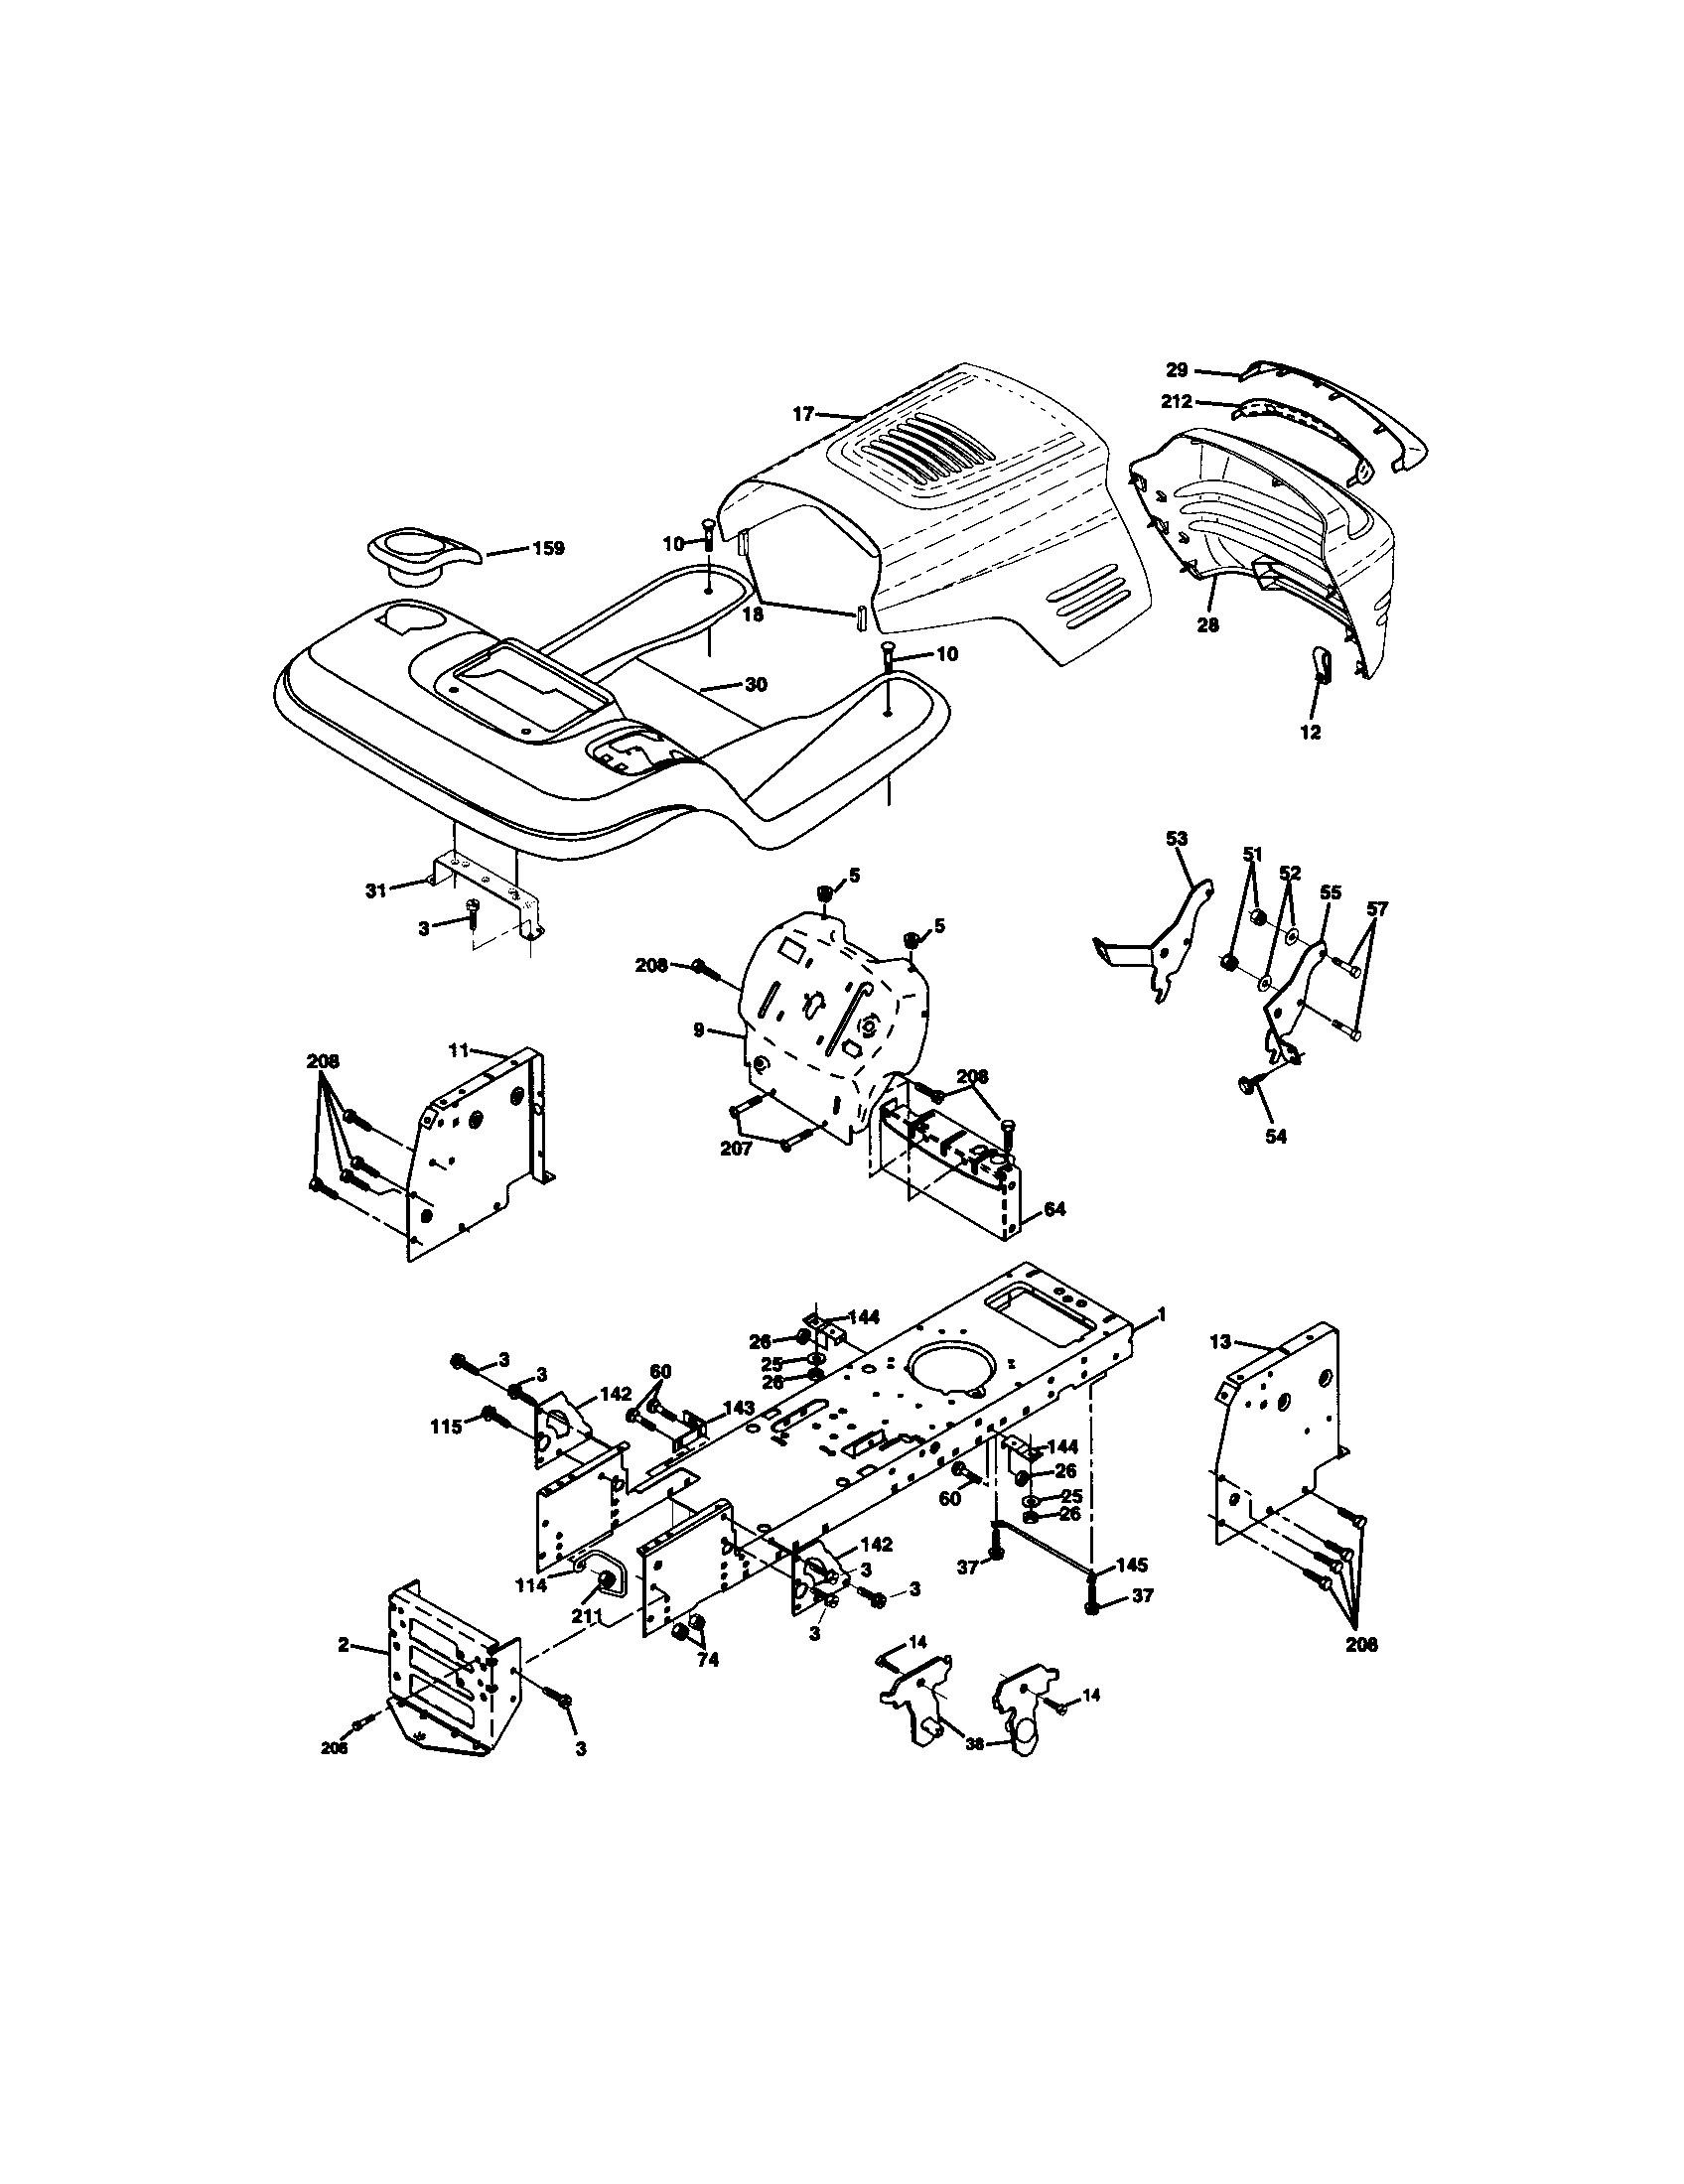 Parts Diagram Craftsman 17.5 Hp Lawn Mower Craftsman Front Engine Lawn Tractor Parts Of Parts Diagram Craftsman 17.5 Hp Lawn Mower